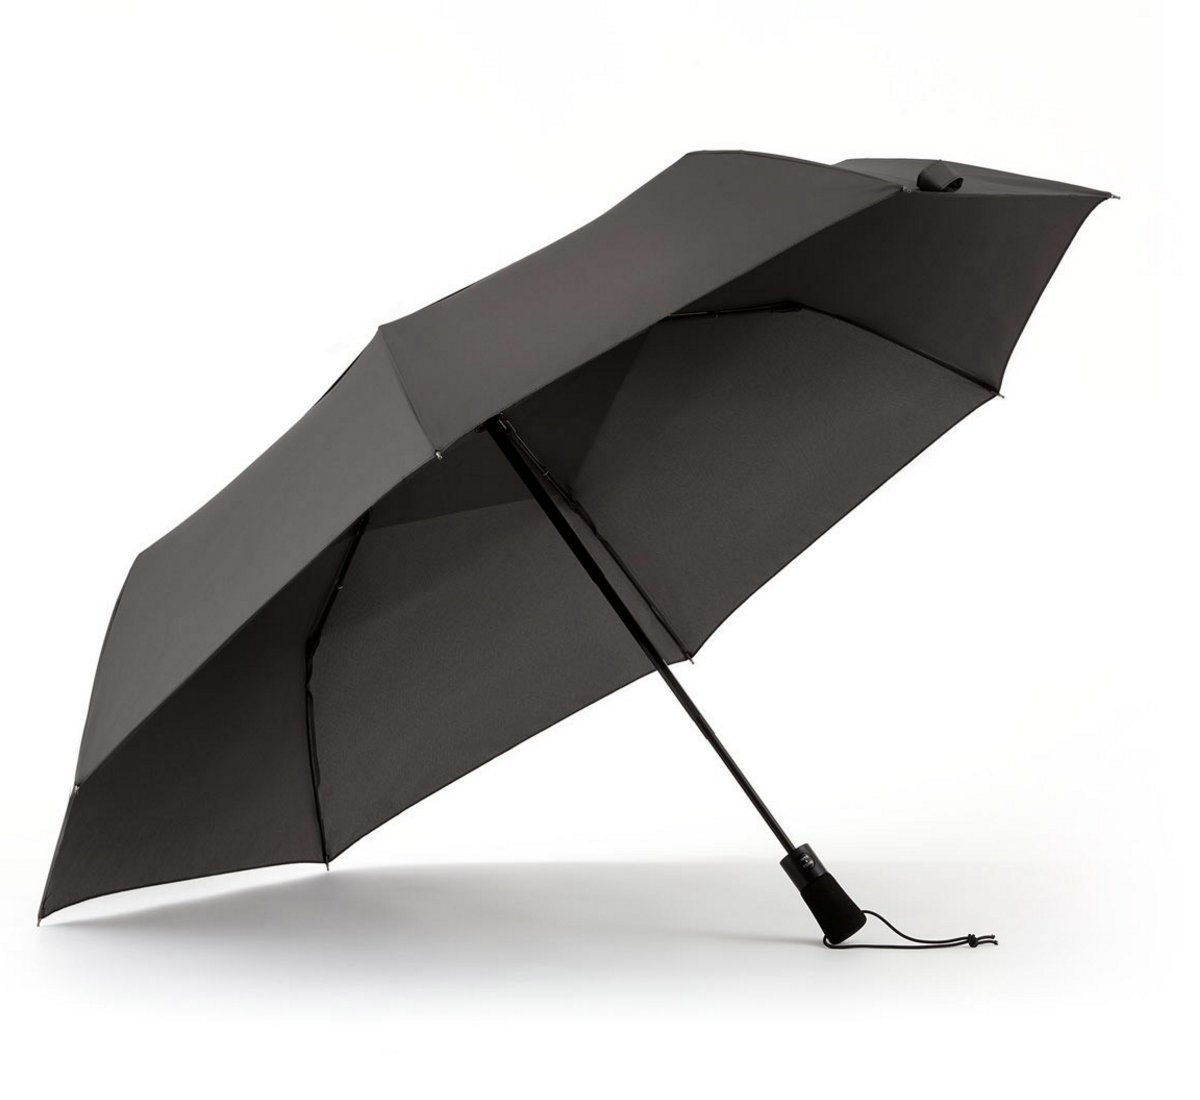 ShedRain WindPro Vented Auto Open/Auto Close Jumbo Compact Wind Umbrella: Charcoal